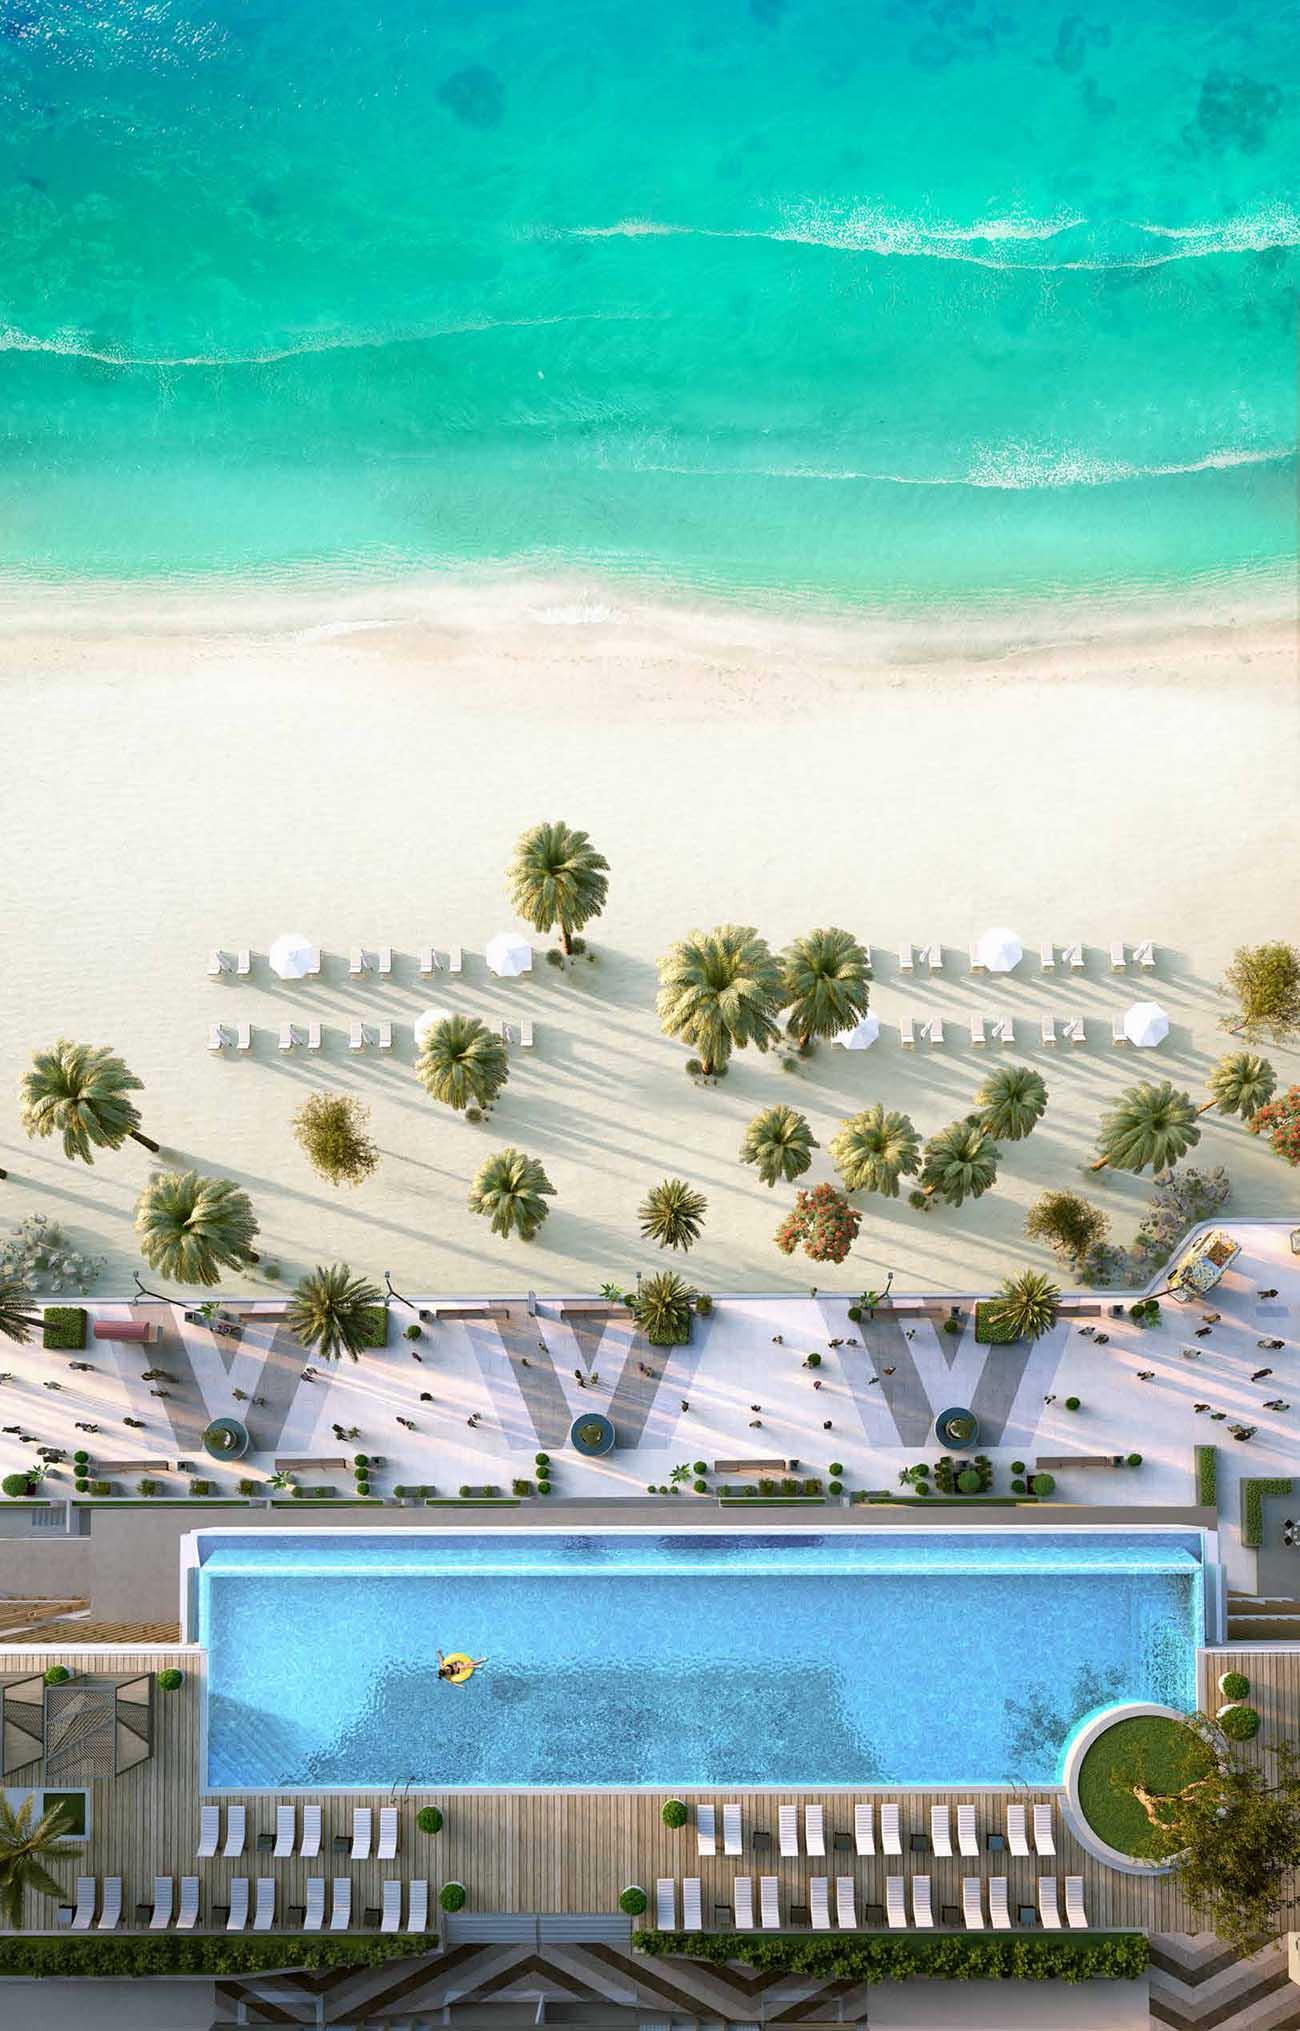 Palace Residences in Dubai Creek Harbour by Emaar, Dubai – Off-Plan Apartments